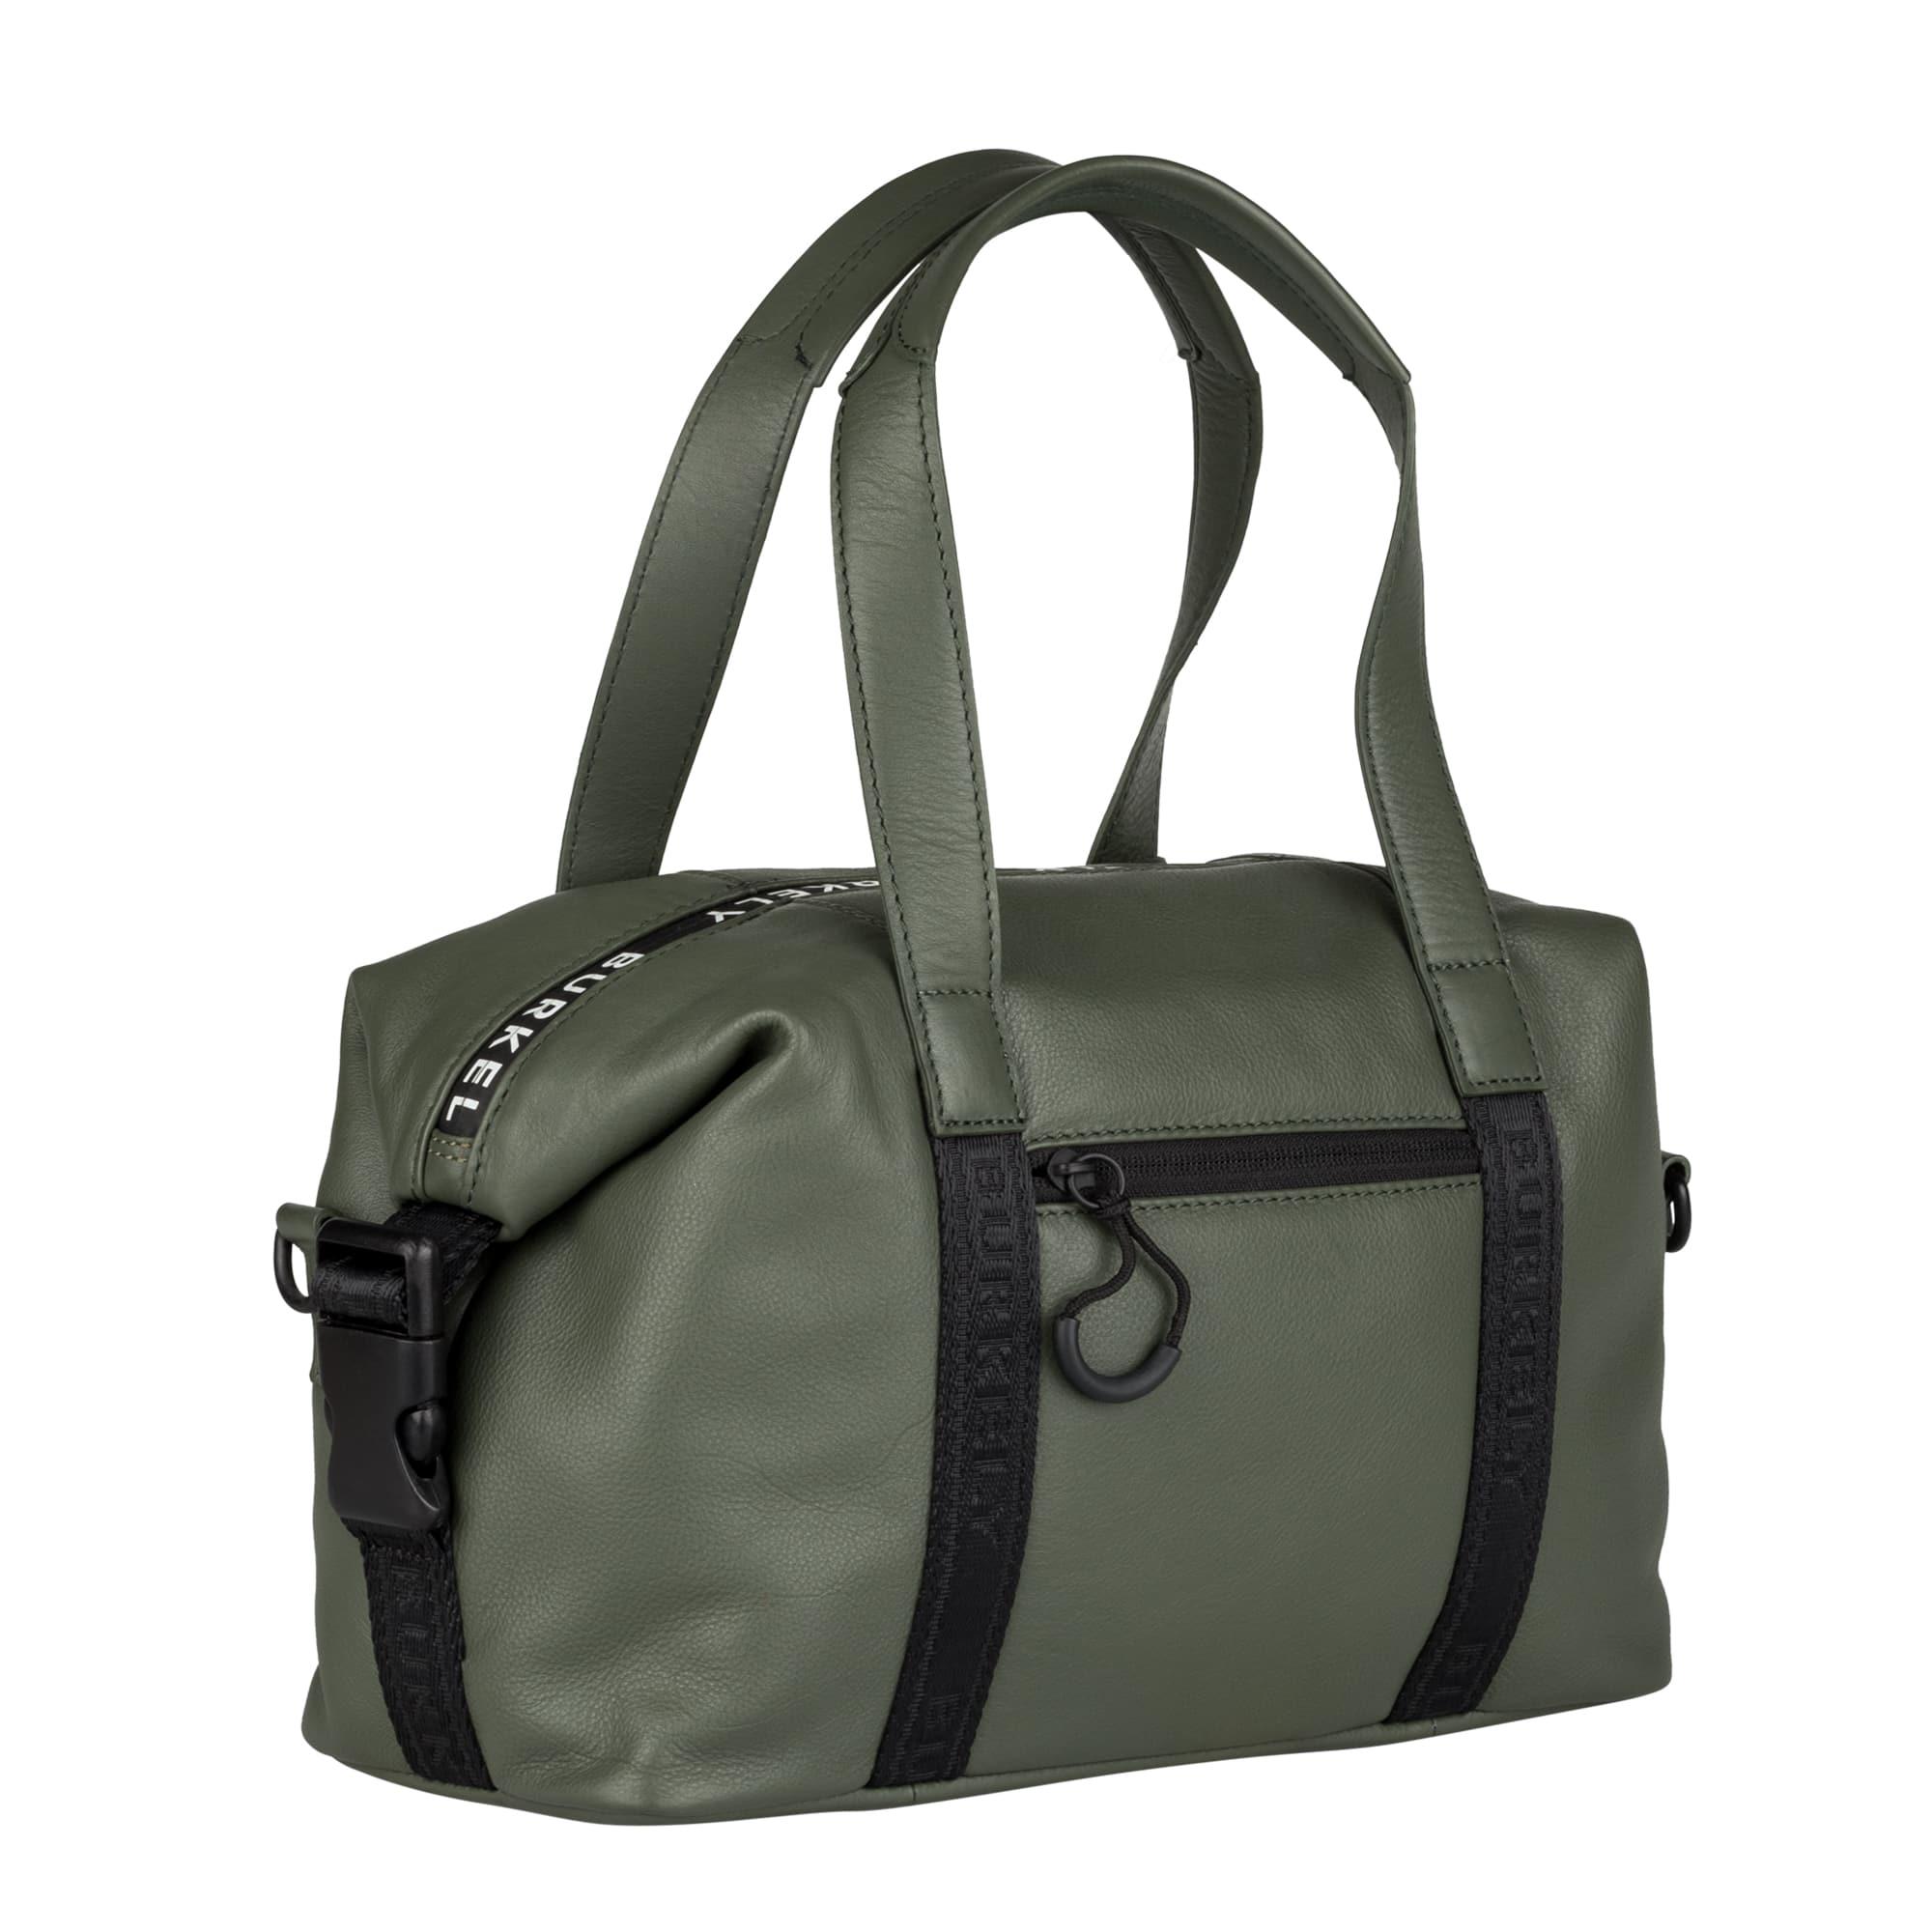 Burkely Rebel Reese Small Handbag Green-185058